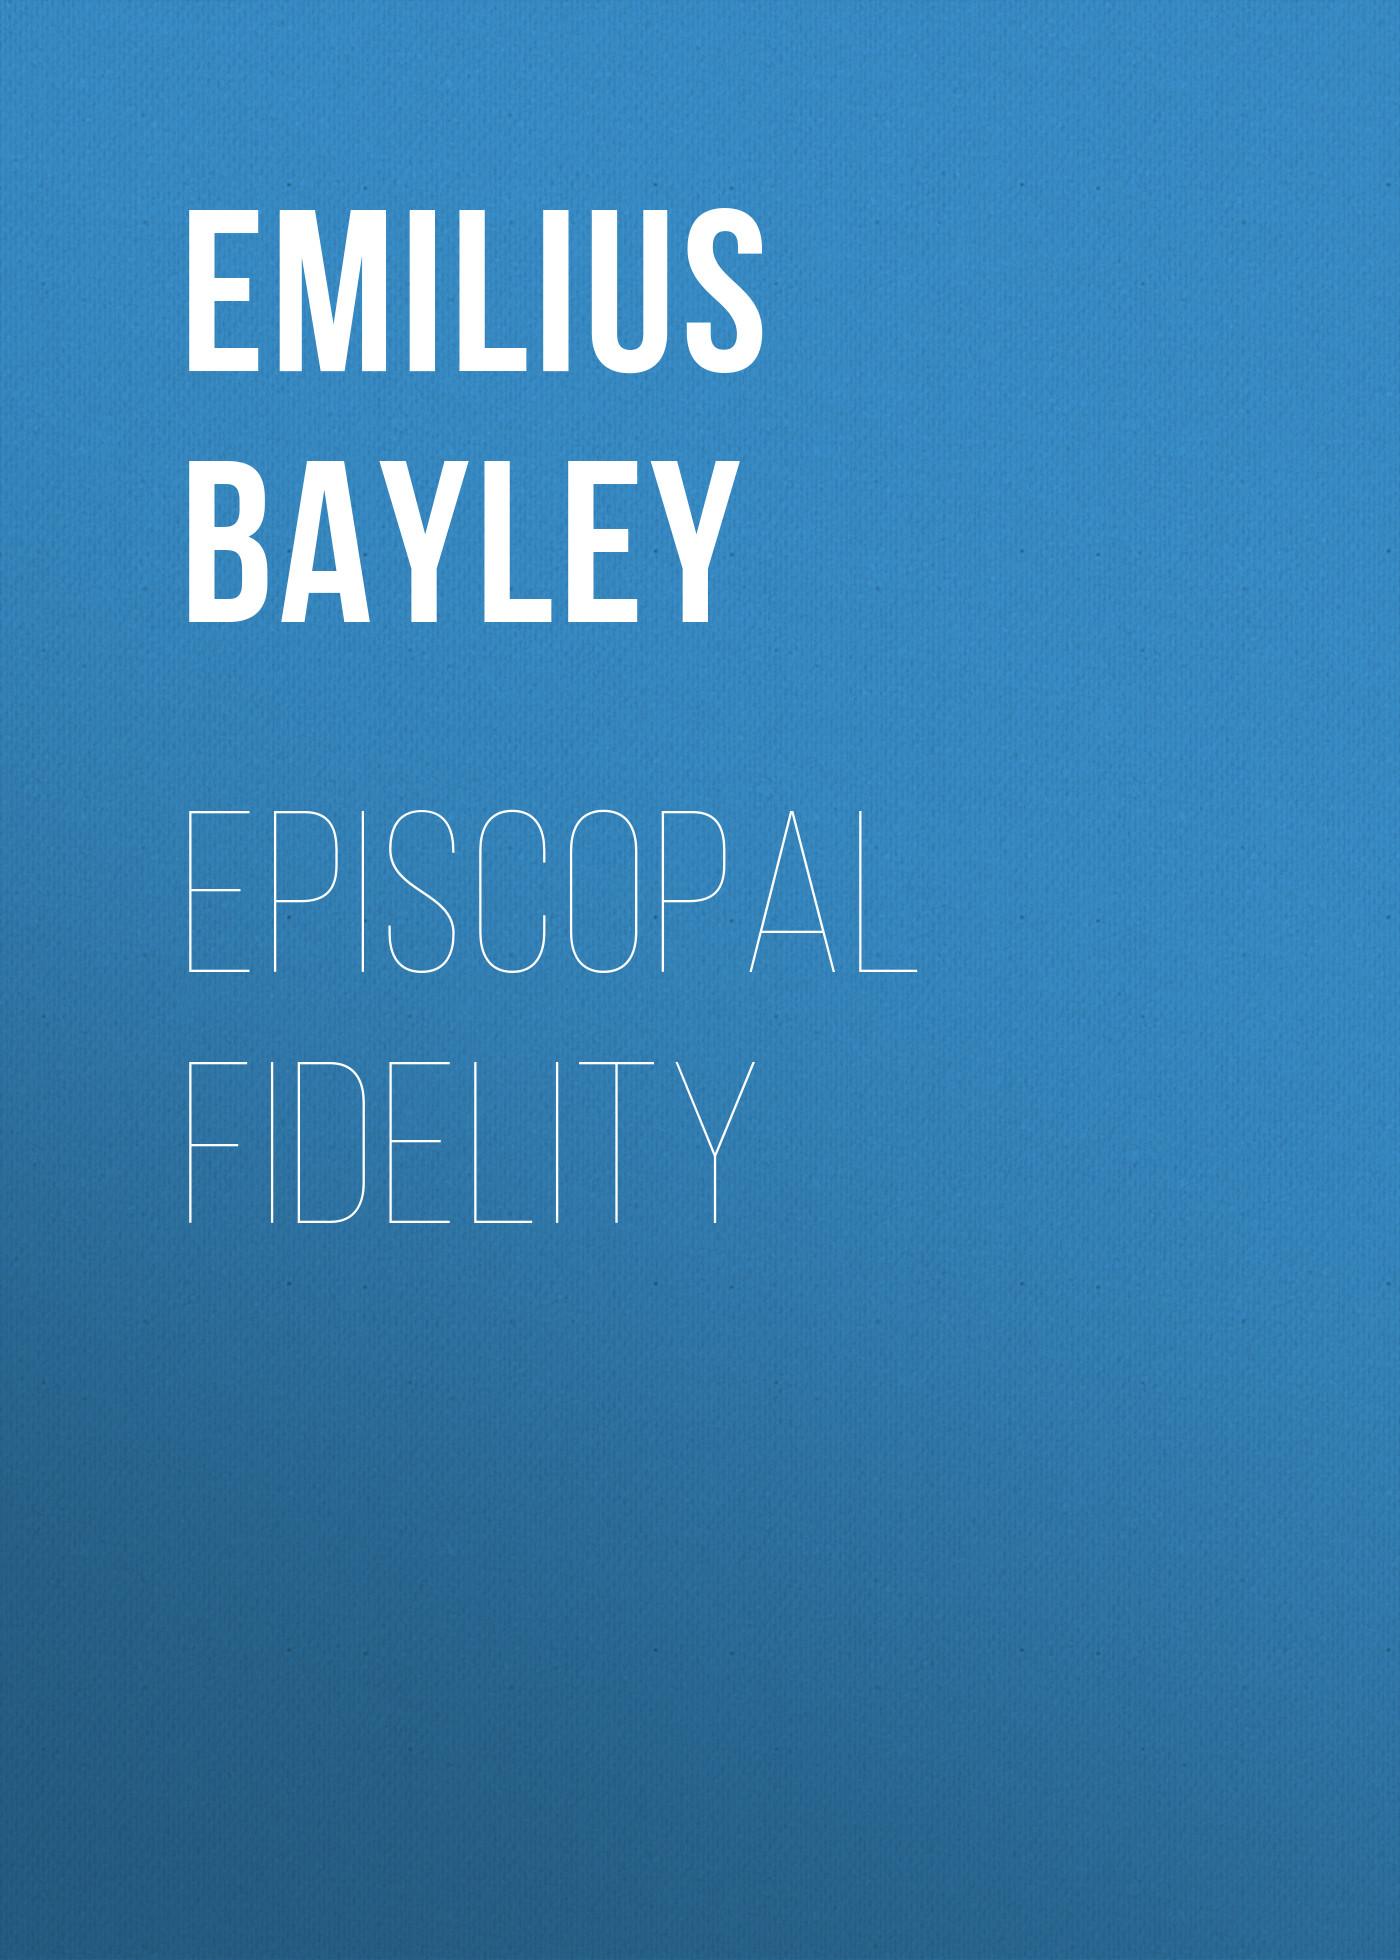 Bayley Emilius Episcopal Fidelity nornby n high fidelity